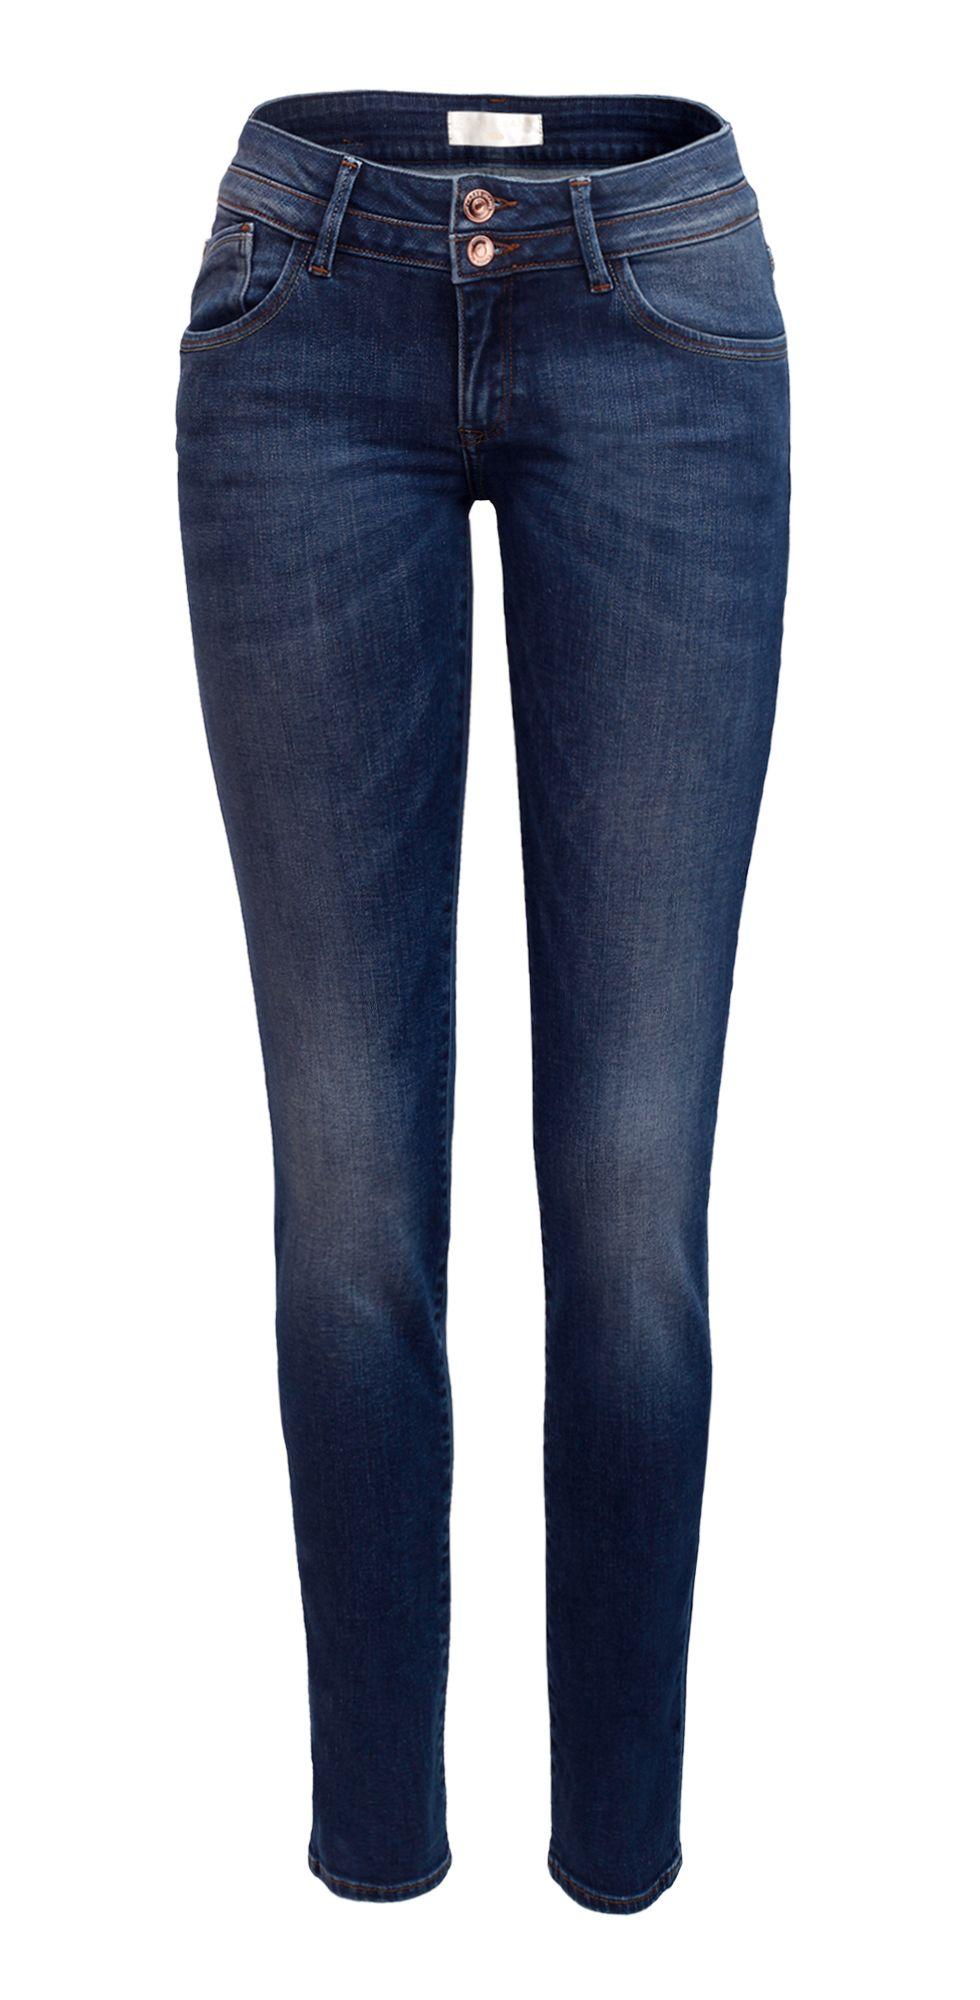 CROSS JEANS ® CROSS Jeans ® Super Skinny Fit Jeans »Adriana«